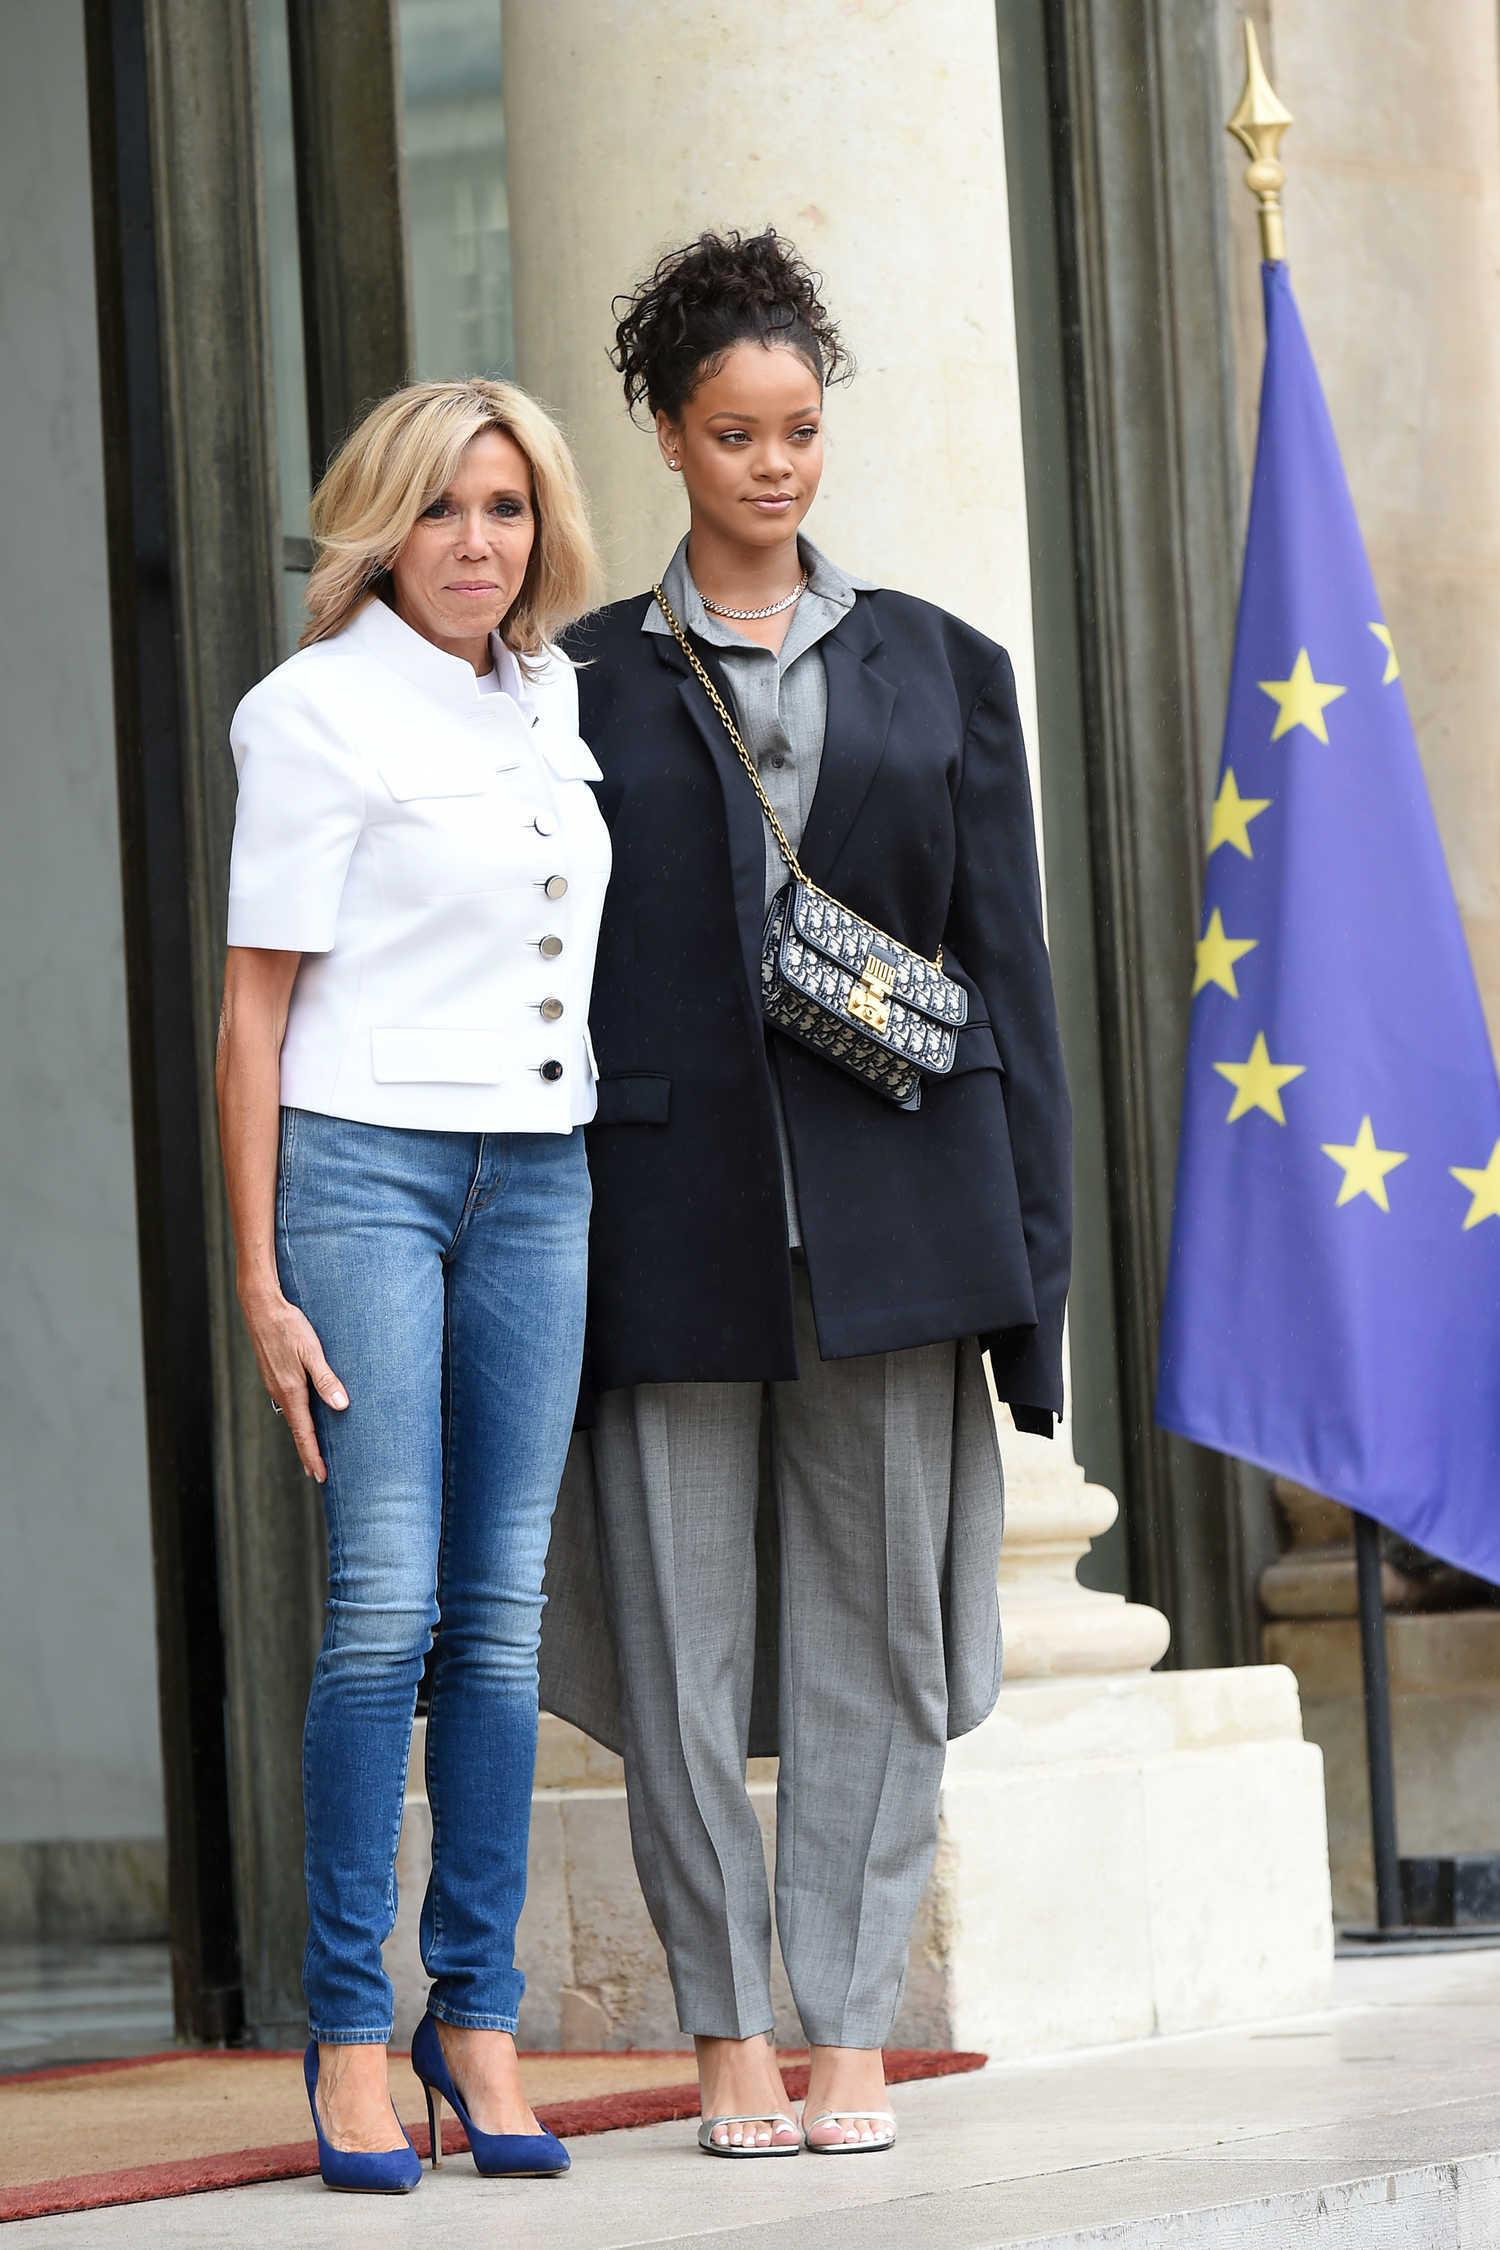 Rihanna Is Welcomed By Brigitte Macron At The Elysee